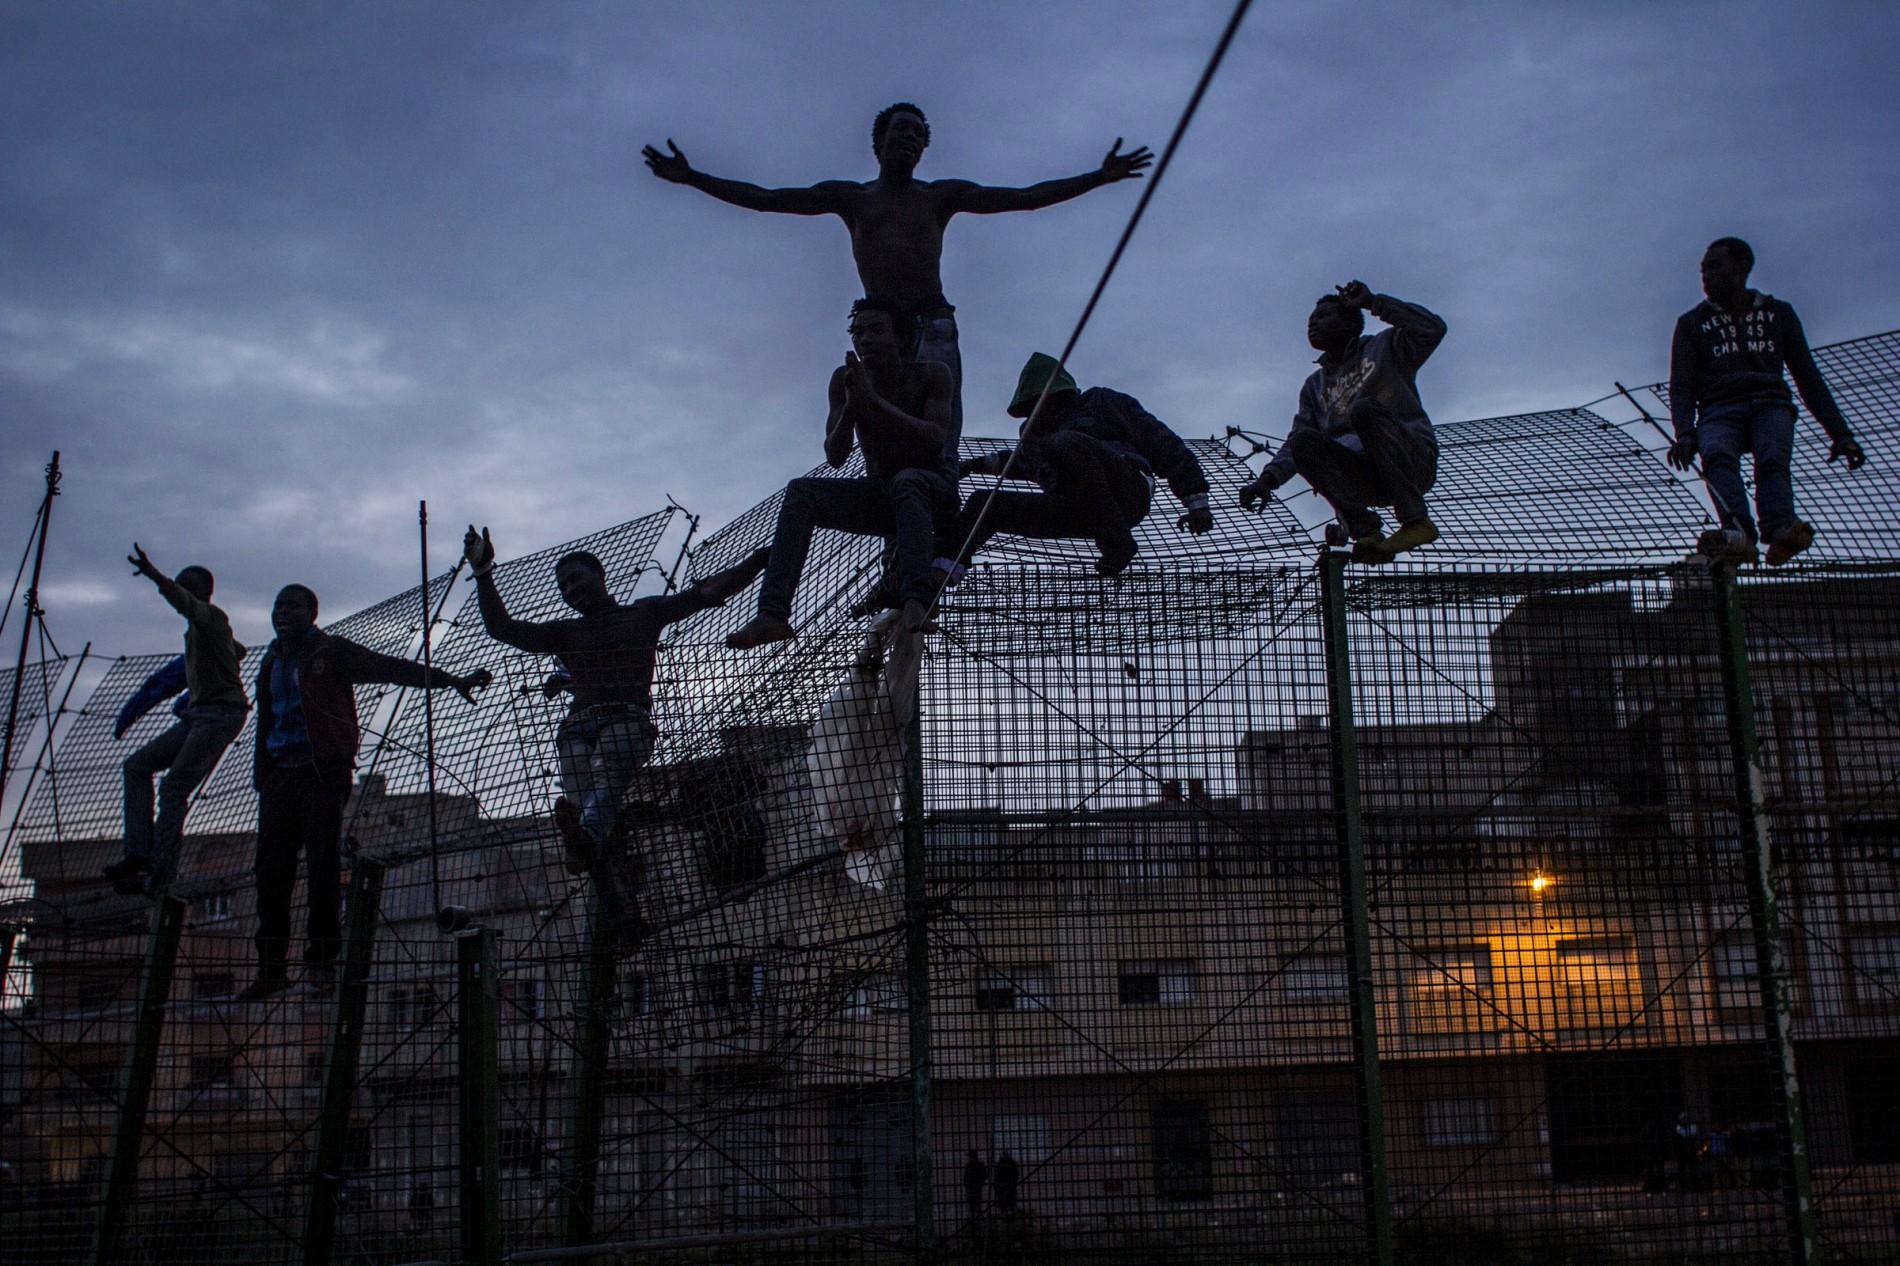 The Wall of Europe by Sergi Cámara